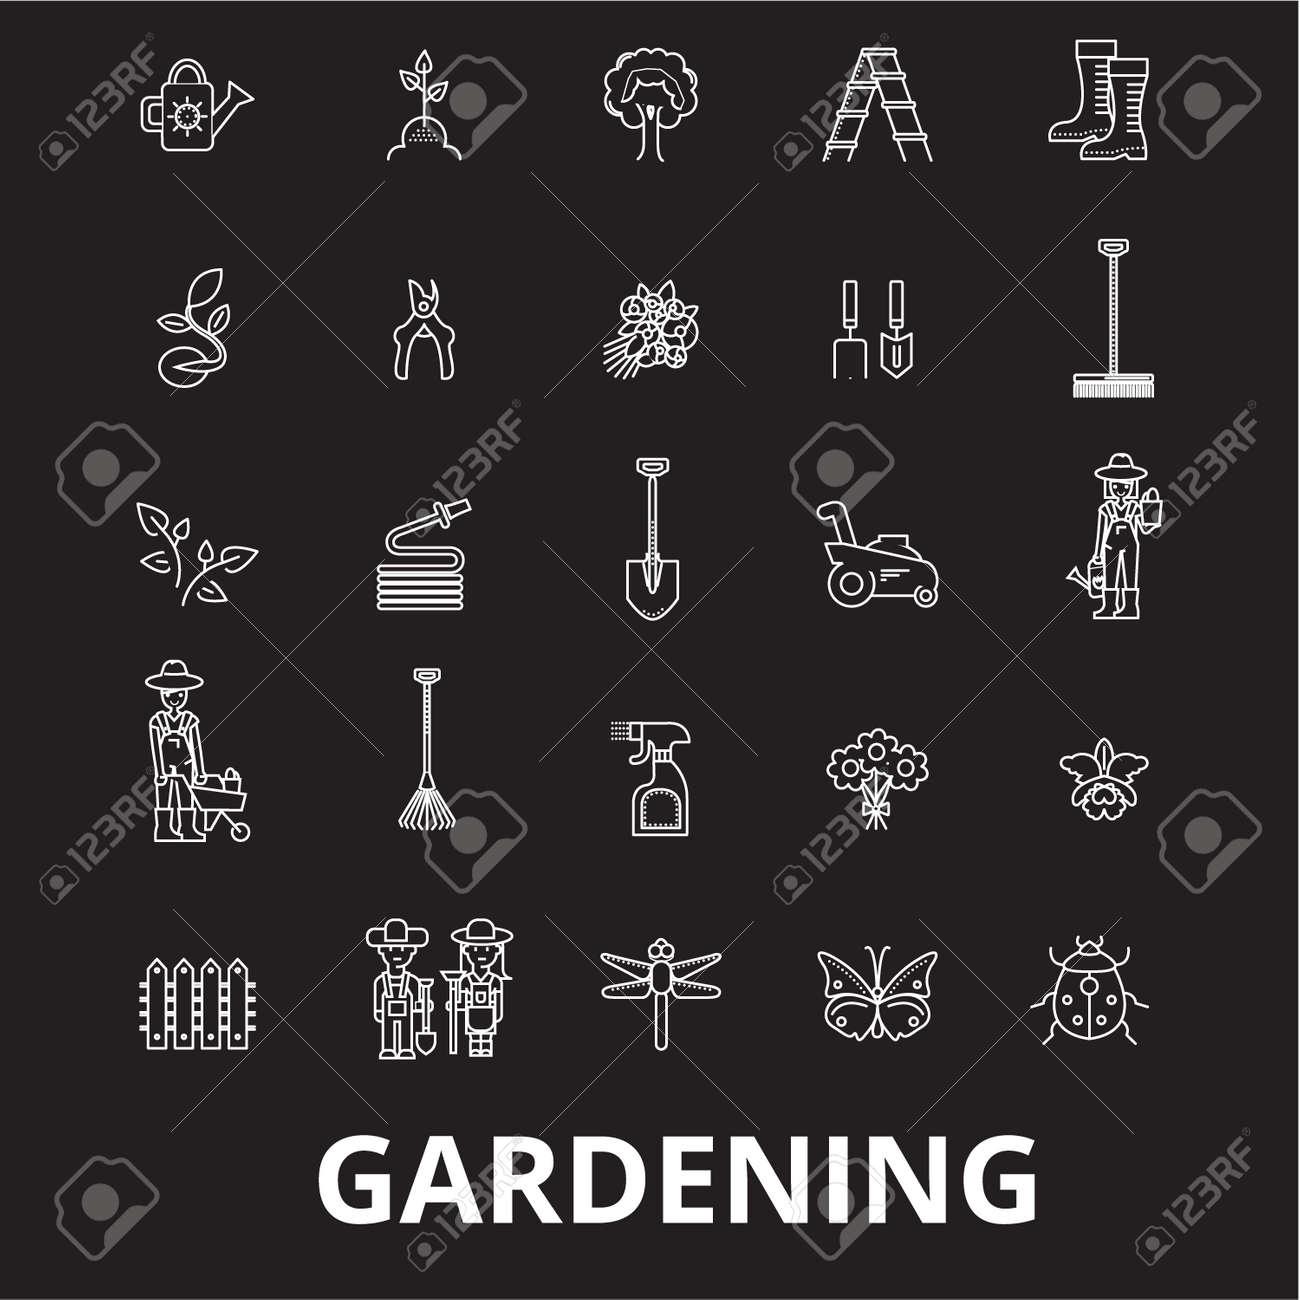 Gardening editable line icons vector set on black background. Gardening white outline illustrations, signs,symbols - 126636527